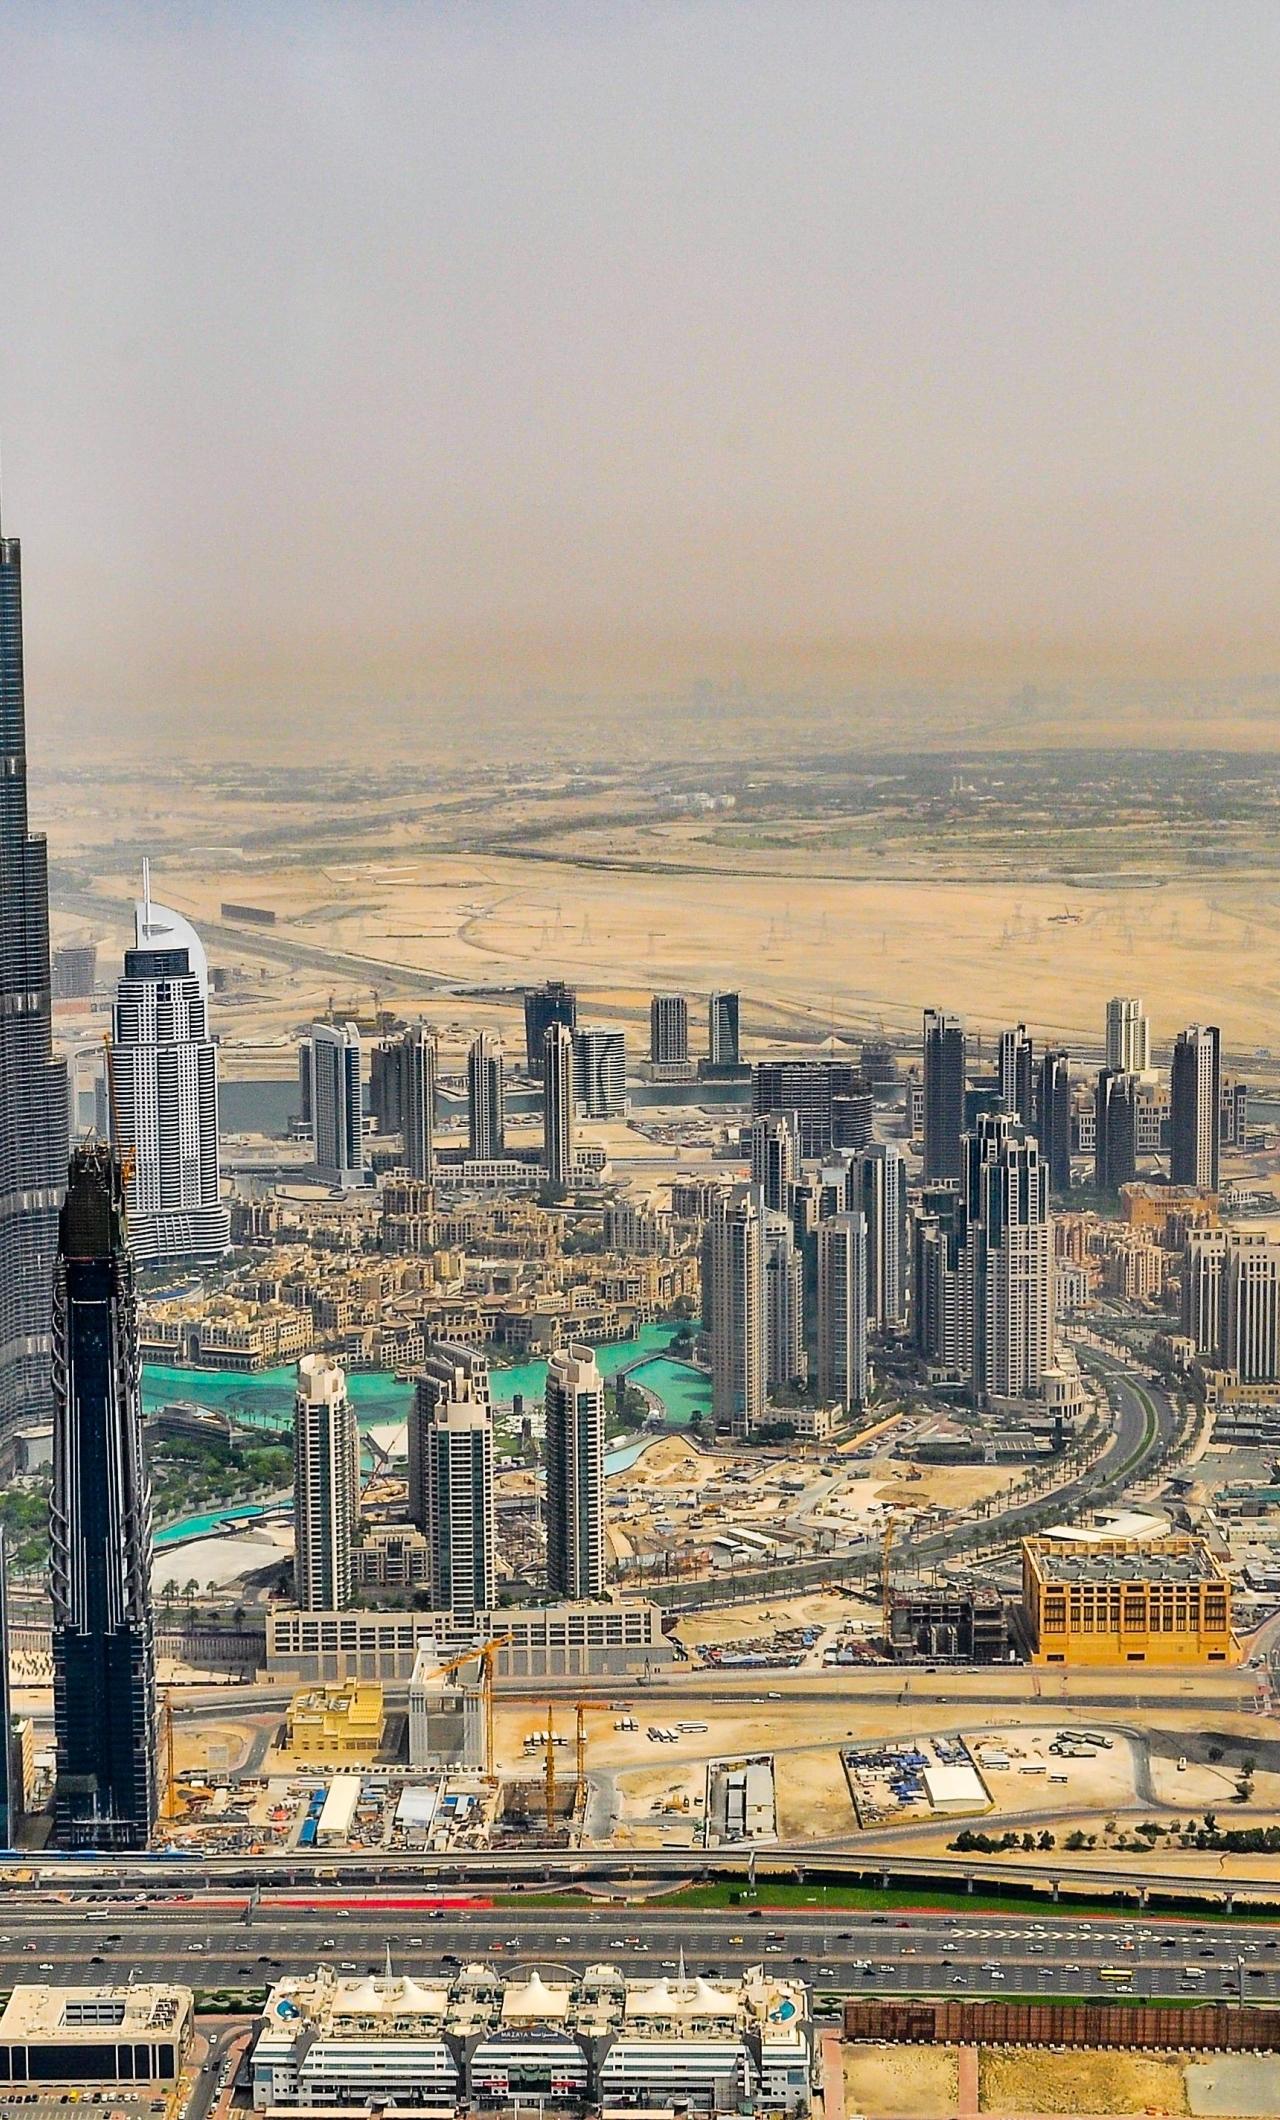 Burj khalifa dubai hd 4k wallpaper - Dubai burj khalifa hd wallpaper ...